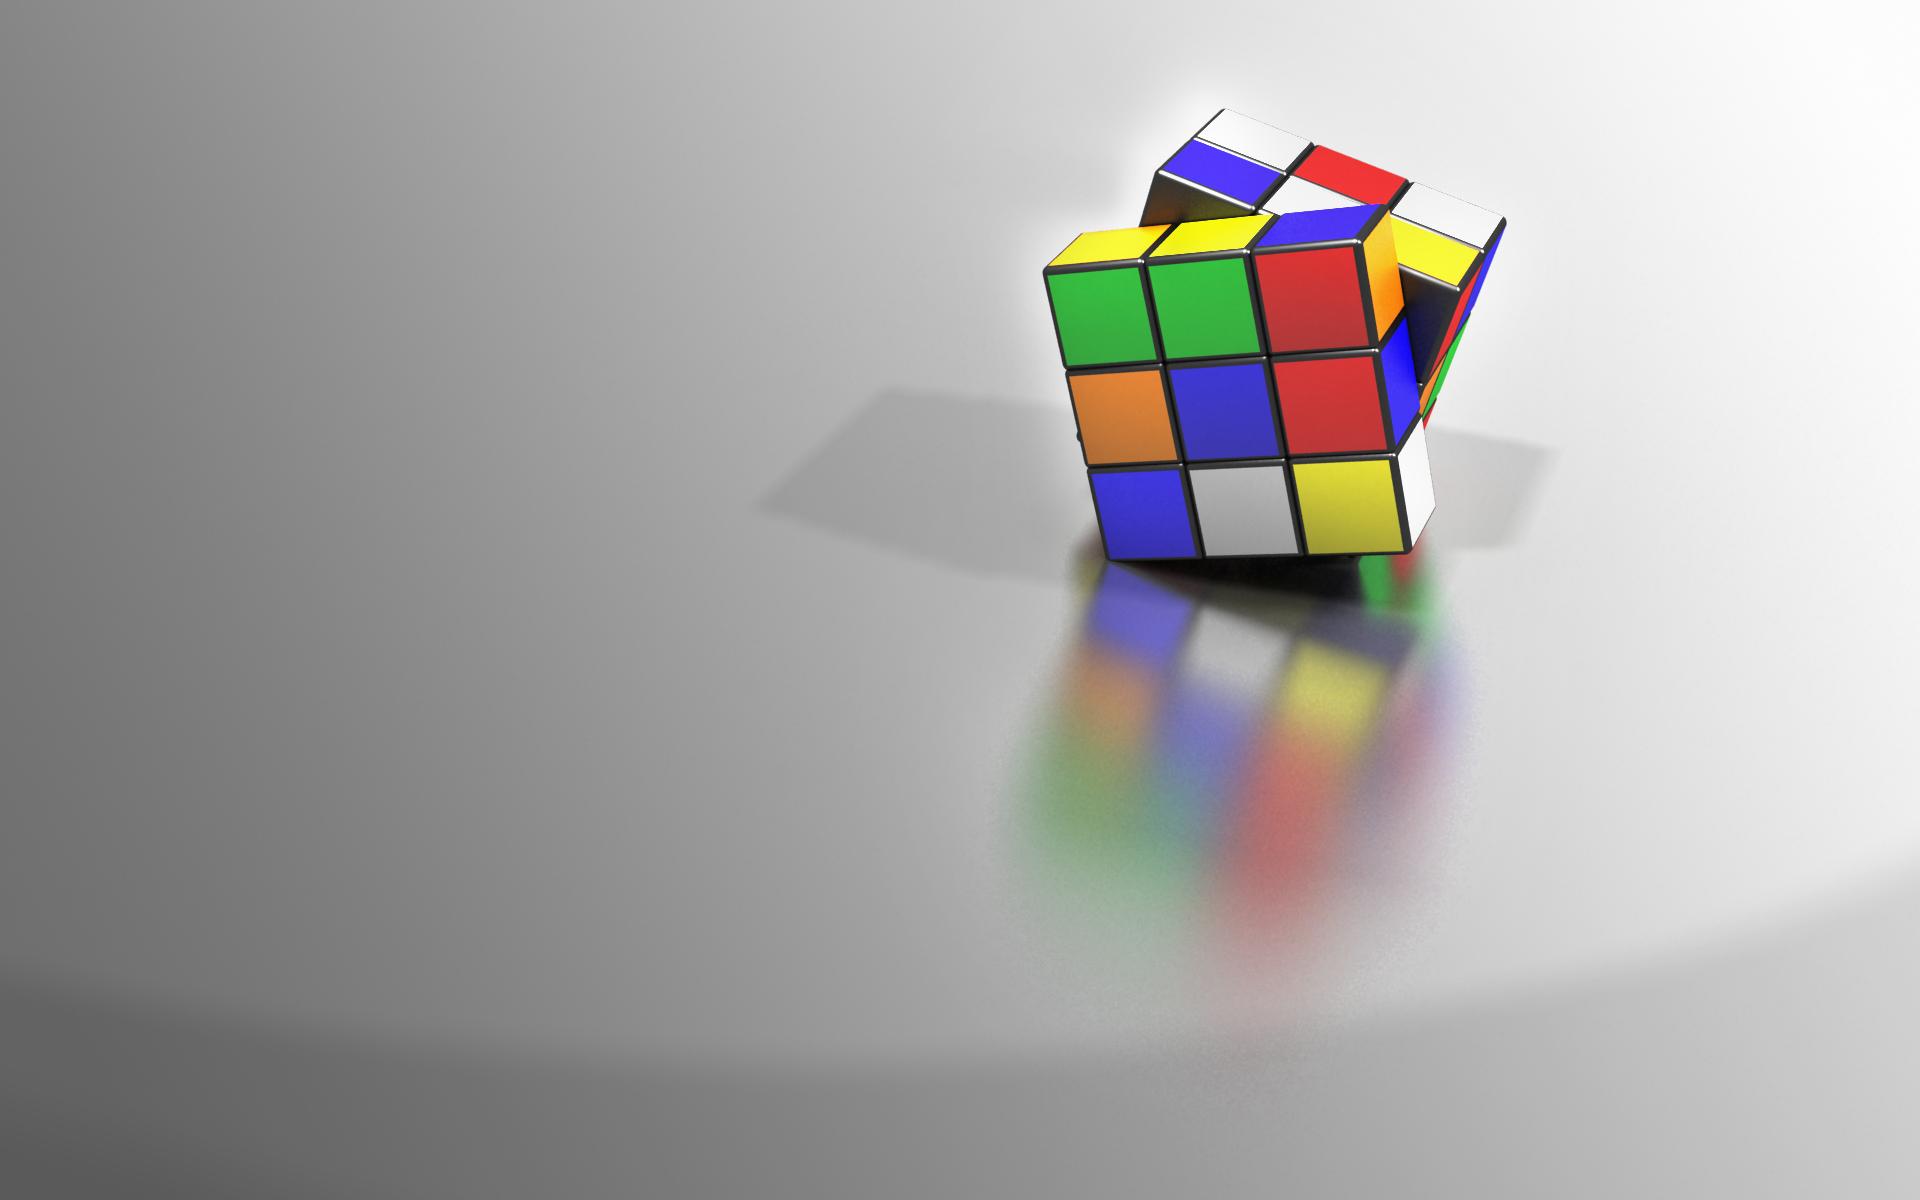 Rubiks Cube Wallpaper Desktop wallpaper   236644 1920x1200